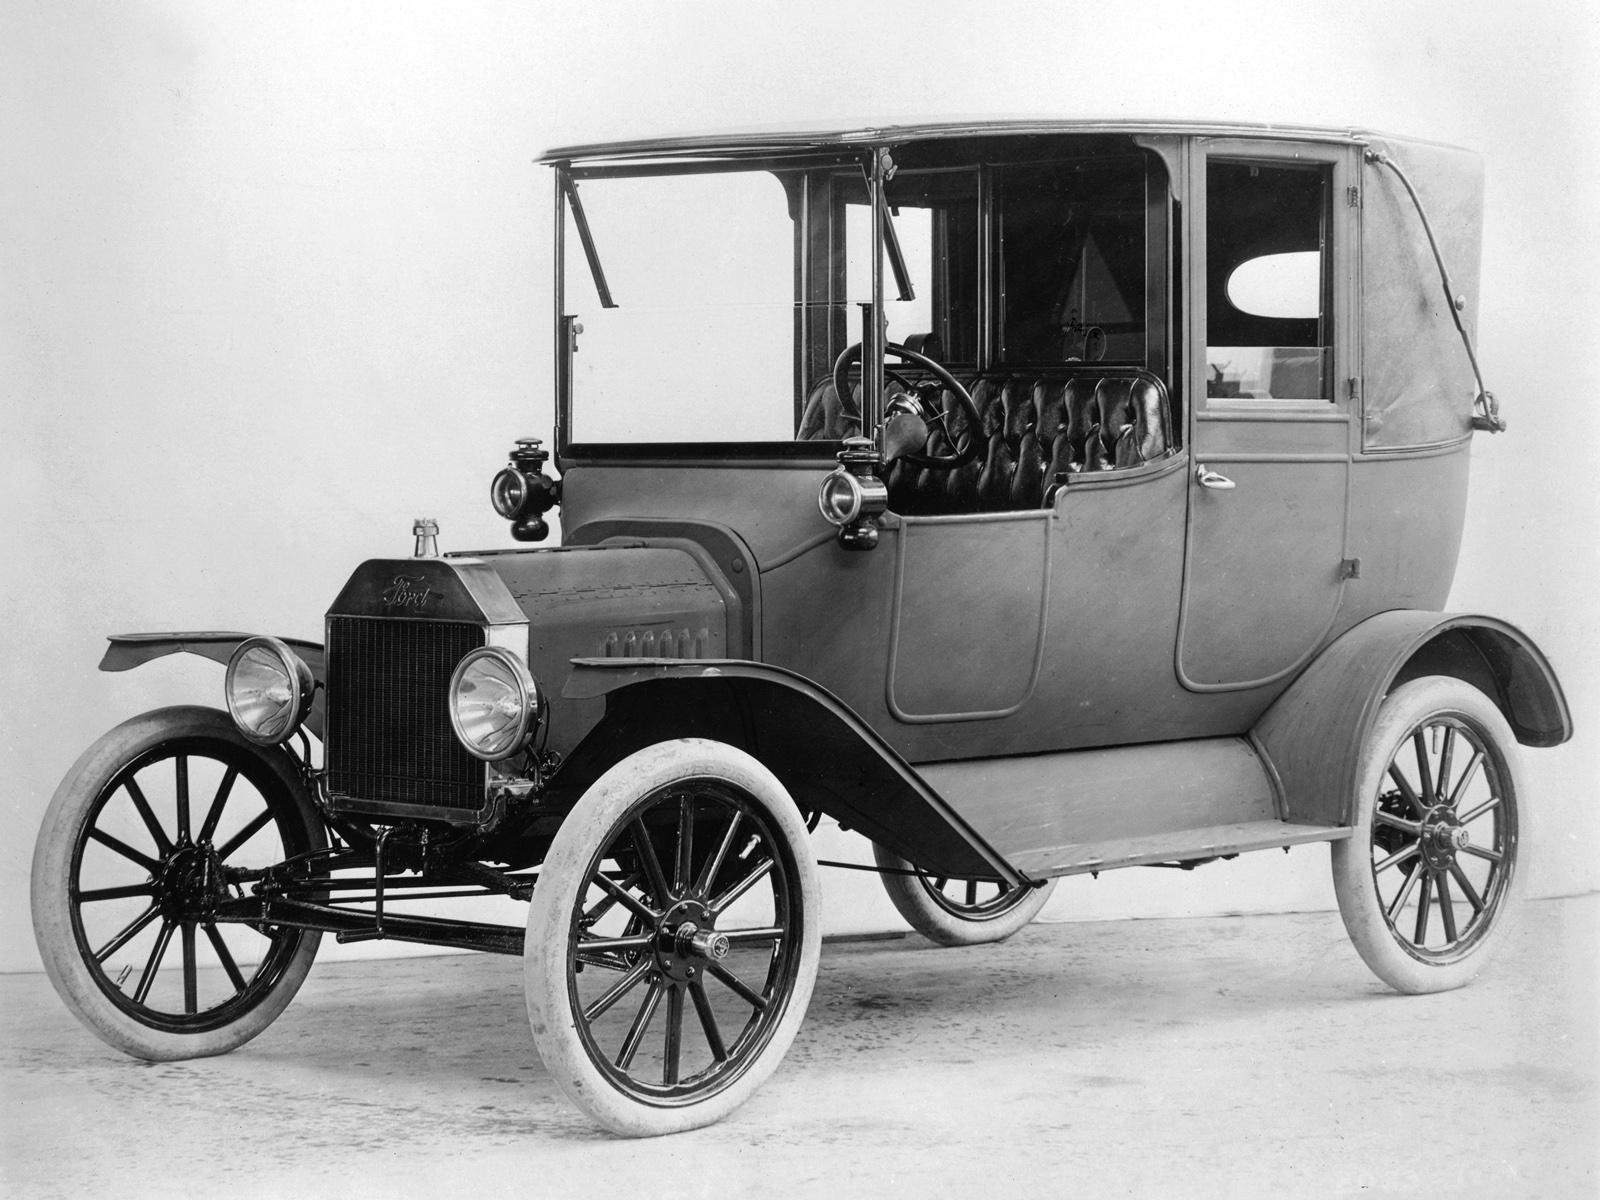 1907 Ford Model T - Milestones